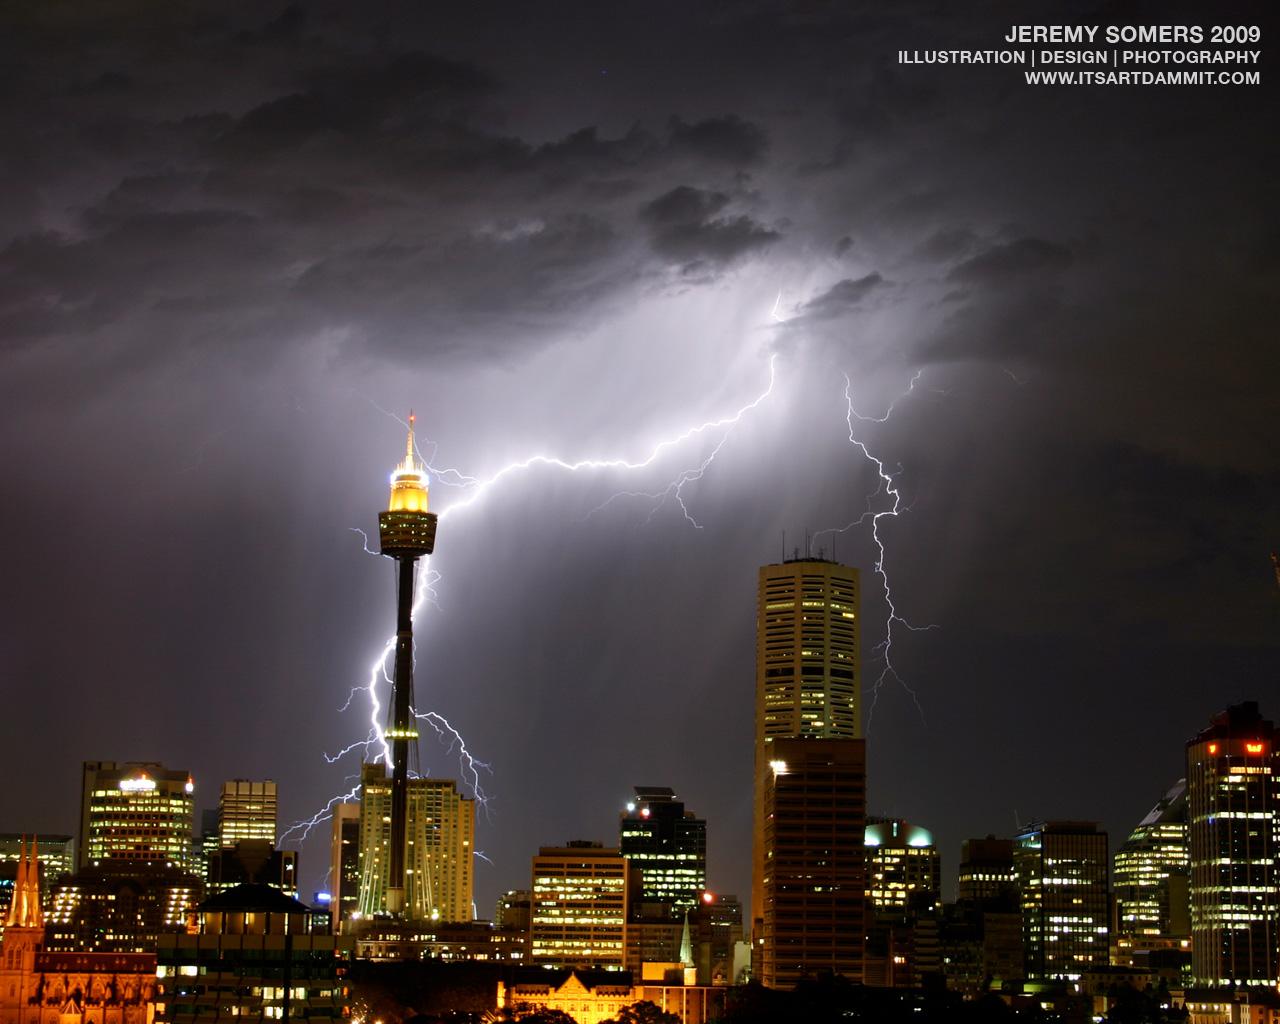 http://2.bp.blogspot.com/-xb-PaI_eqlw/T1bO_-6PpjI/AAAAAAAAIv4/jJXAKVKcEYg/s1600/lightning+storm+wallpaper.jpg